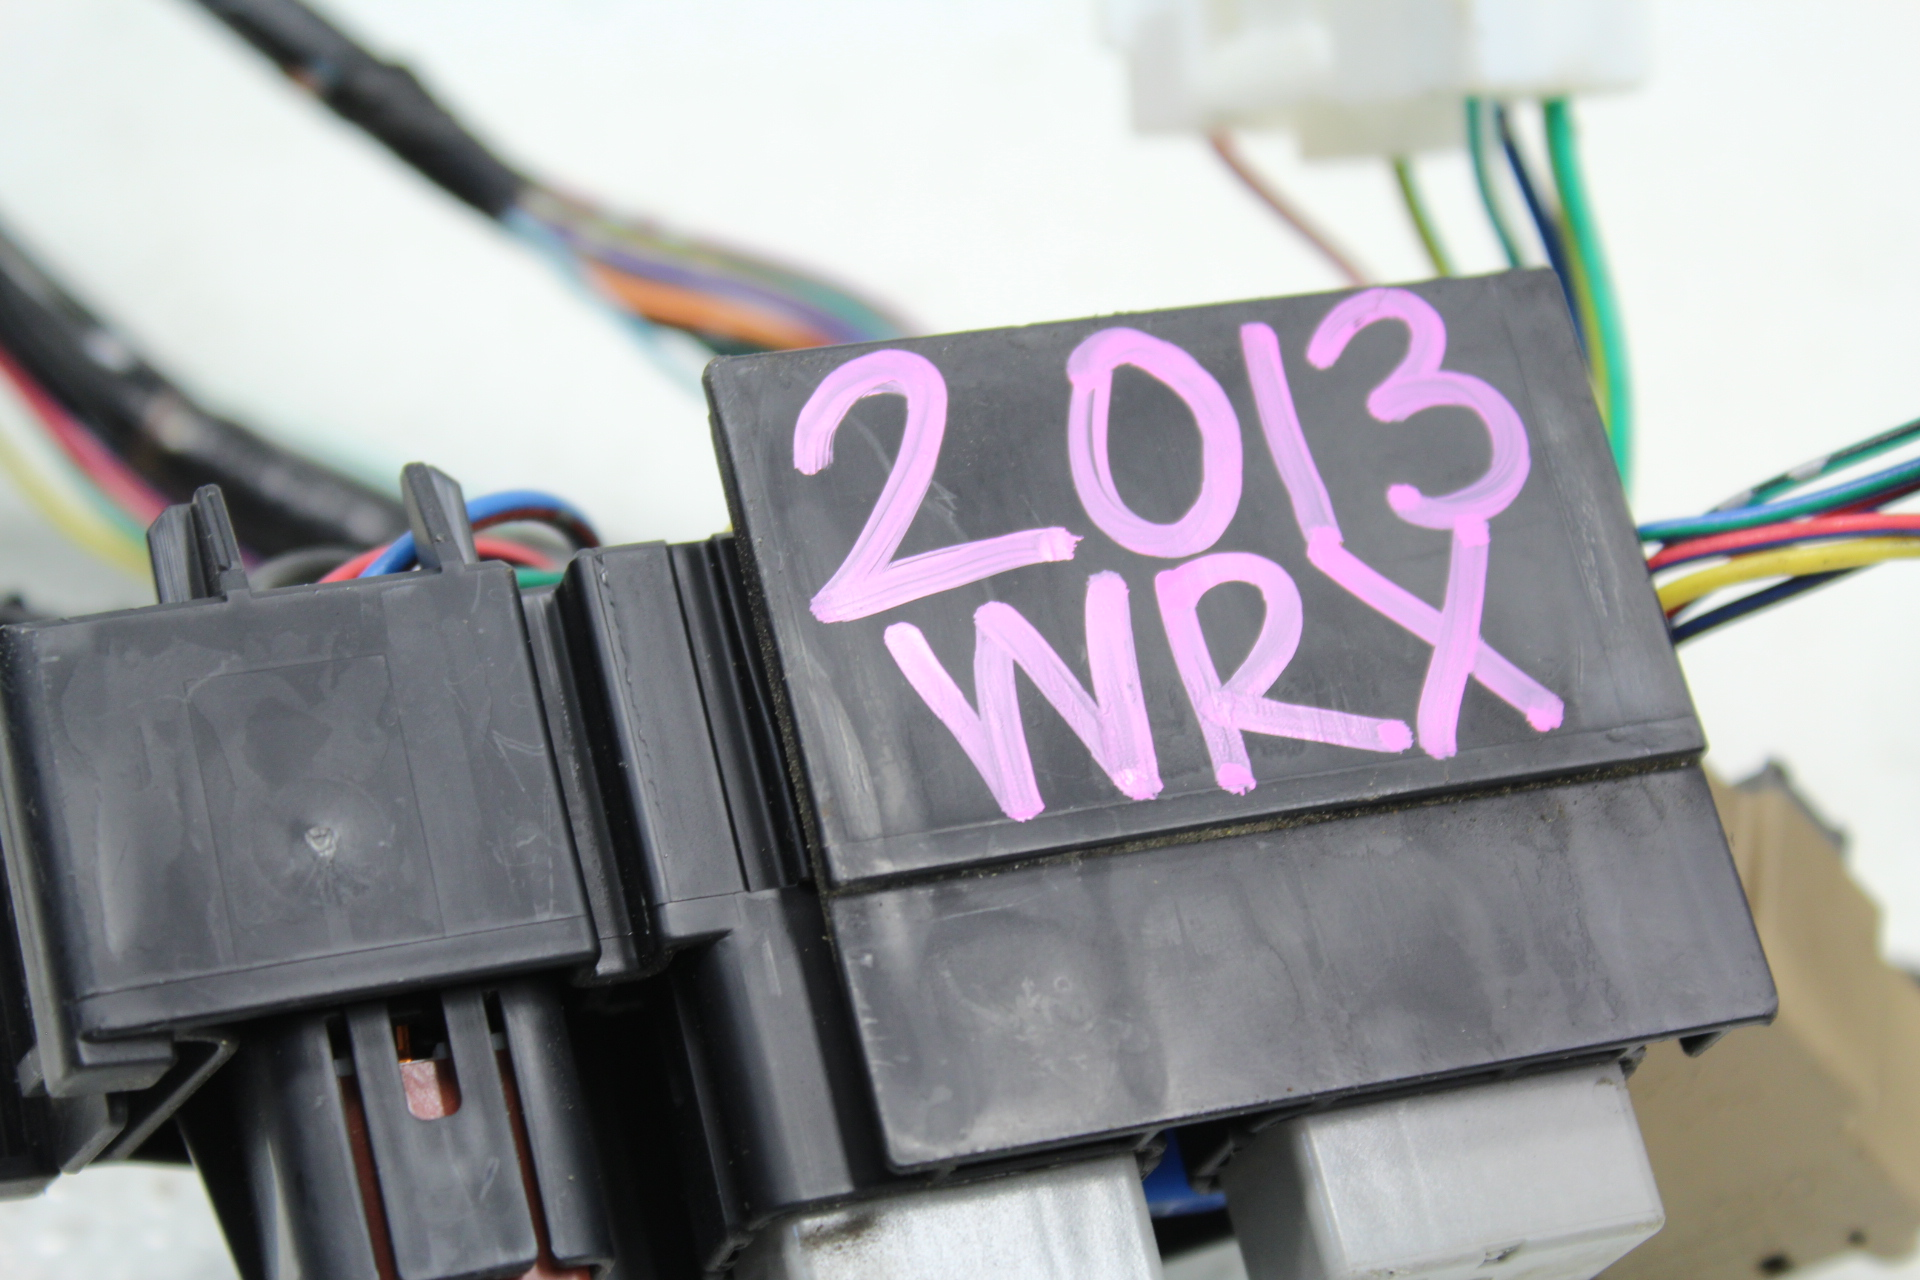 Wrx Wiring Harness Cost